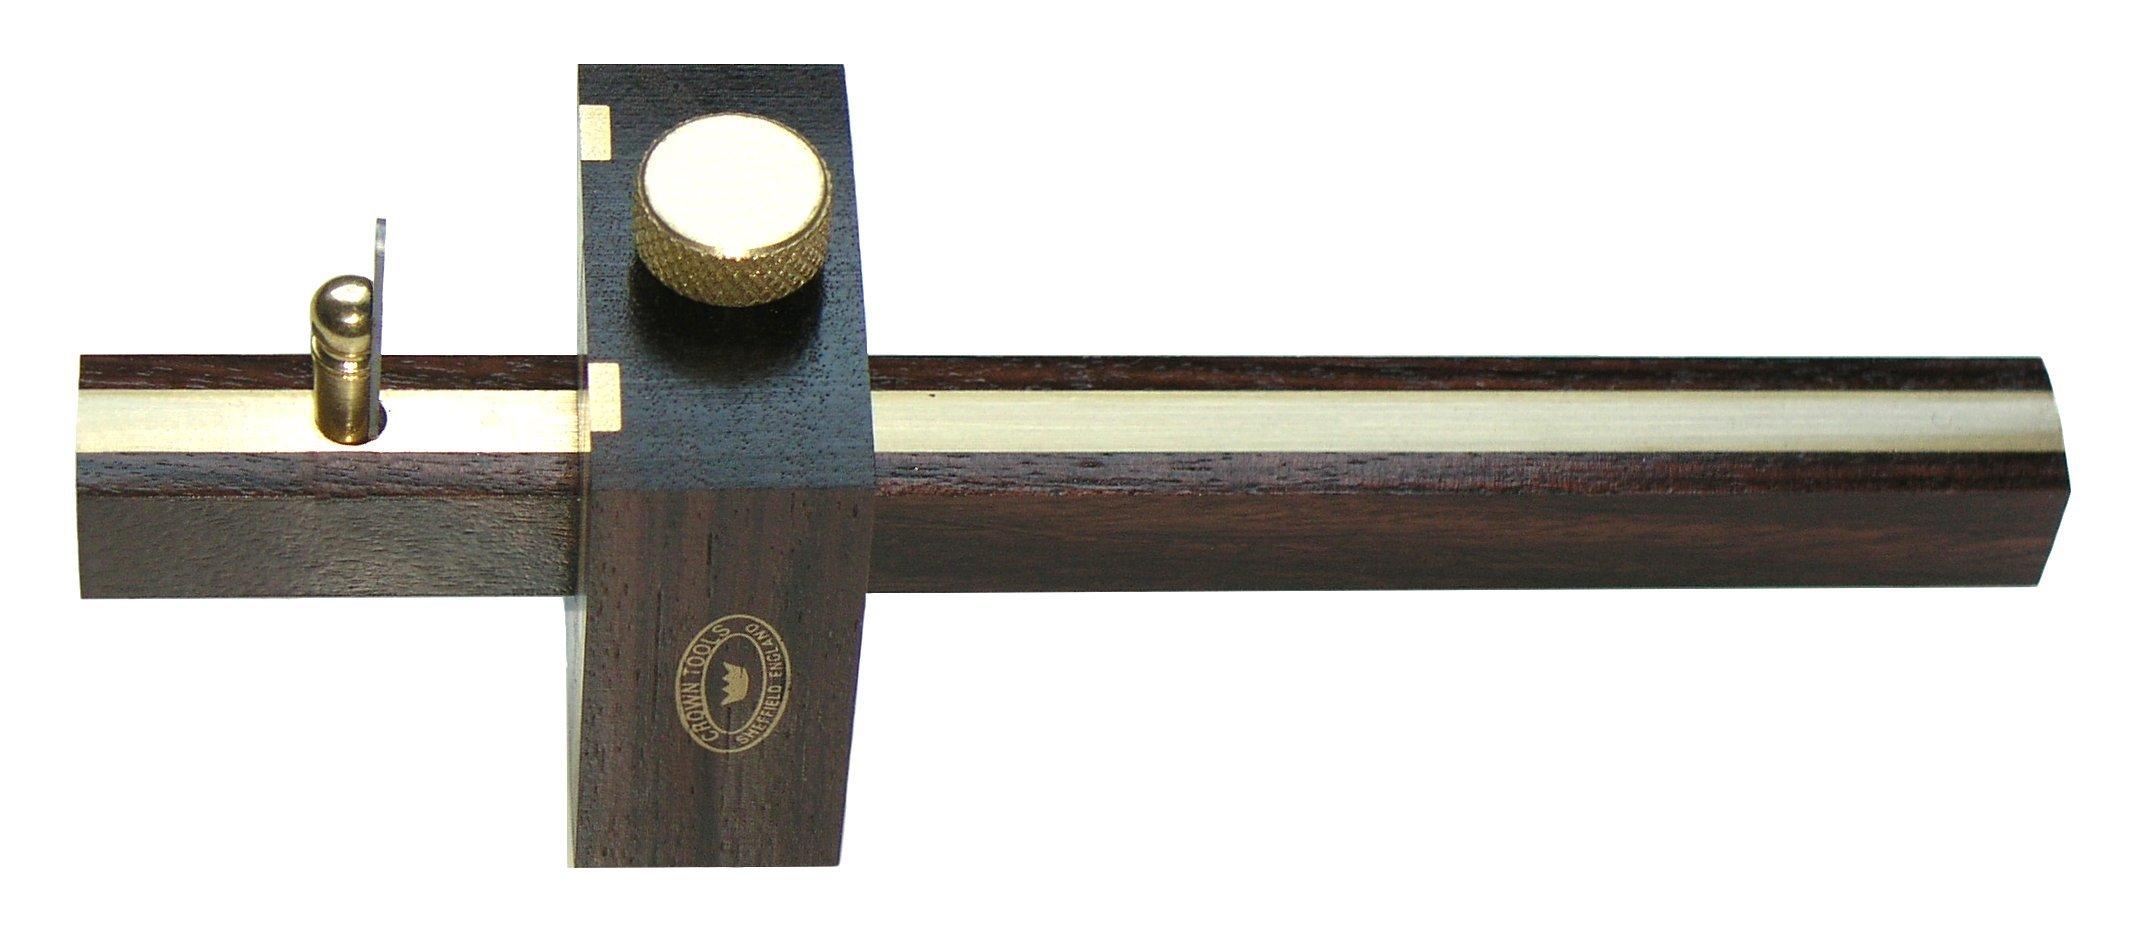 Crown Tools 143 / Big Horn 20153 Miniature Cutting Gauge, Rosewood